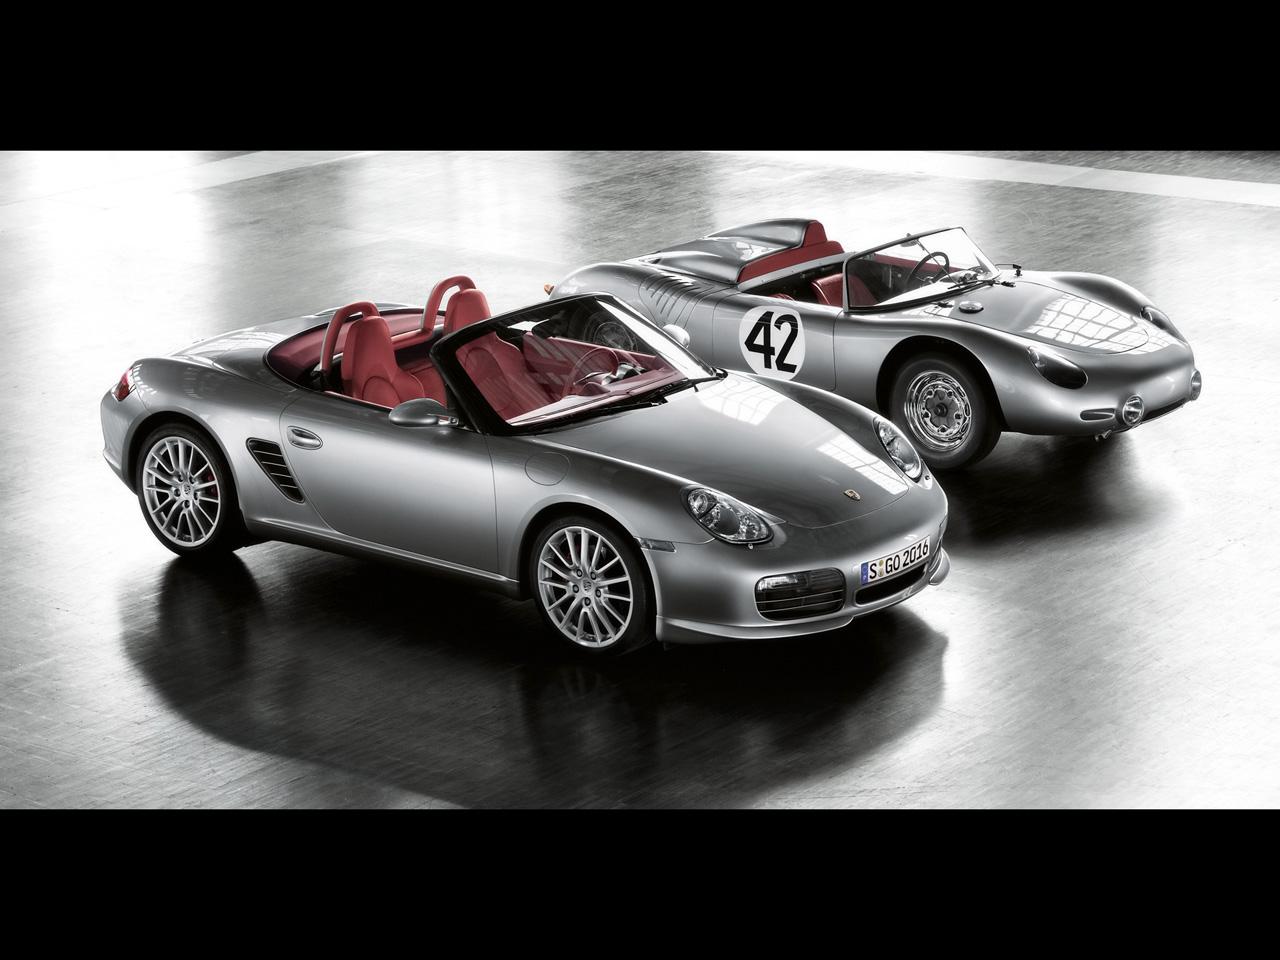 Porsche (official topic) 2008-Porsche-Boxster-RS-60-Spyder-718-RS-60-Spyder-1280x960